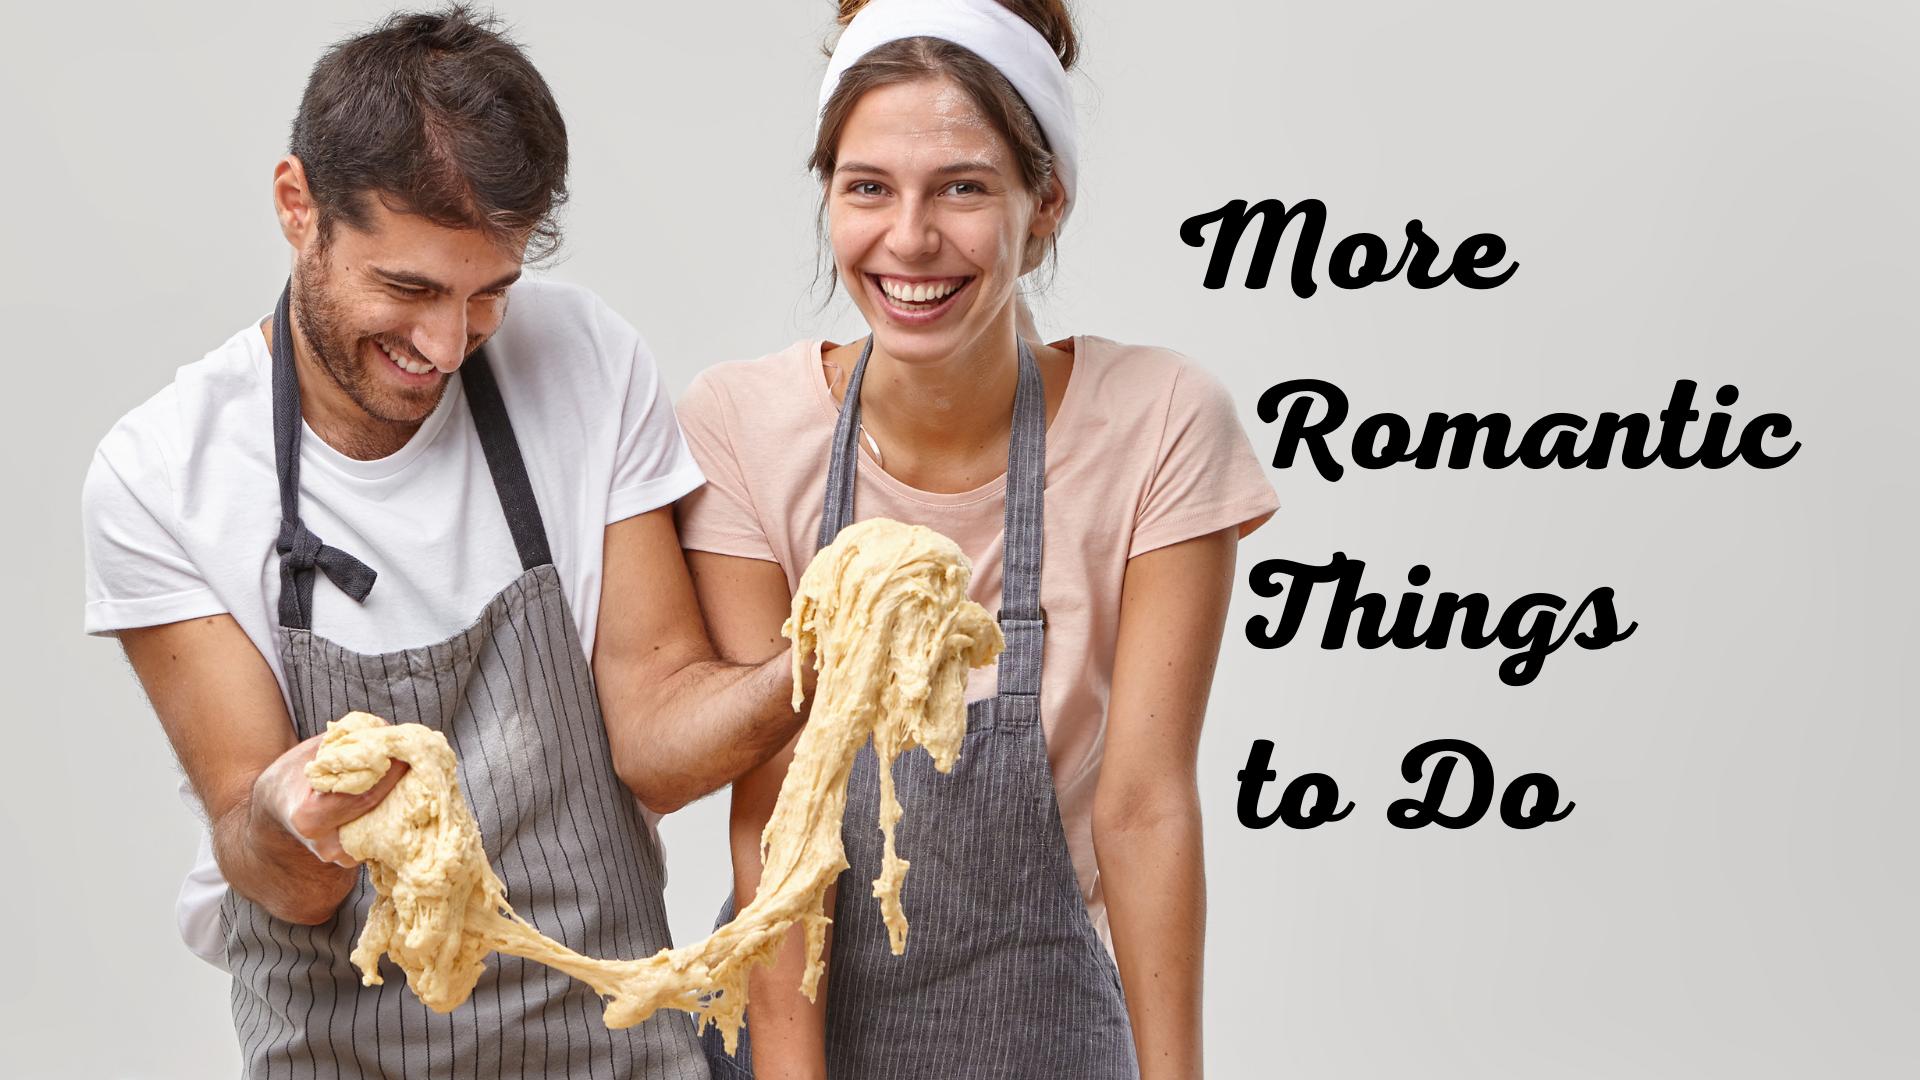 More Romantic Things